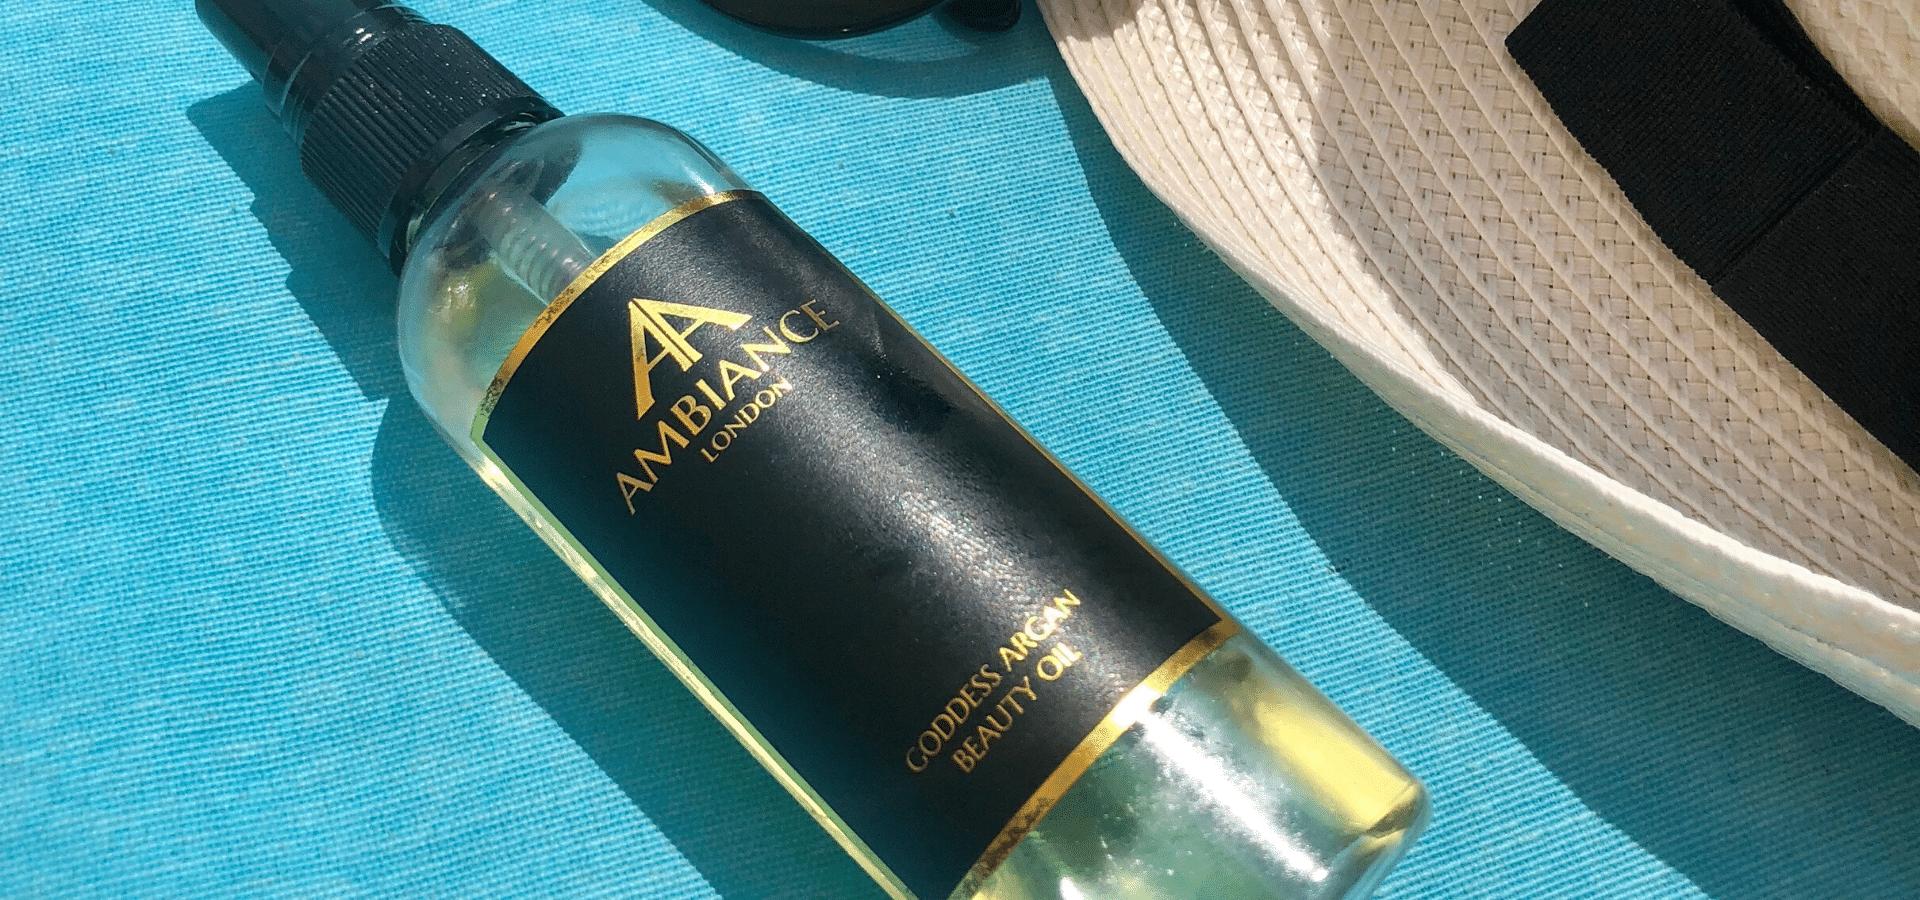 award winning goddess argan beauty oil